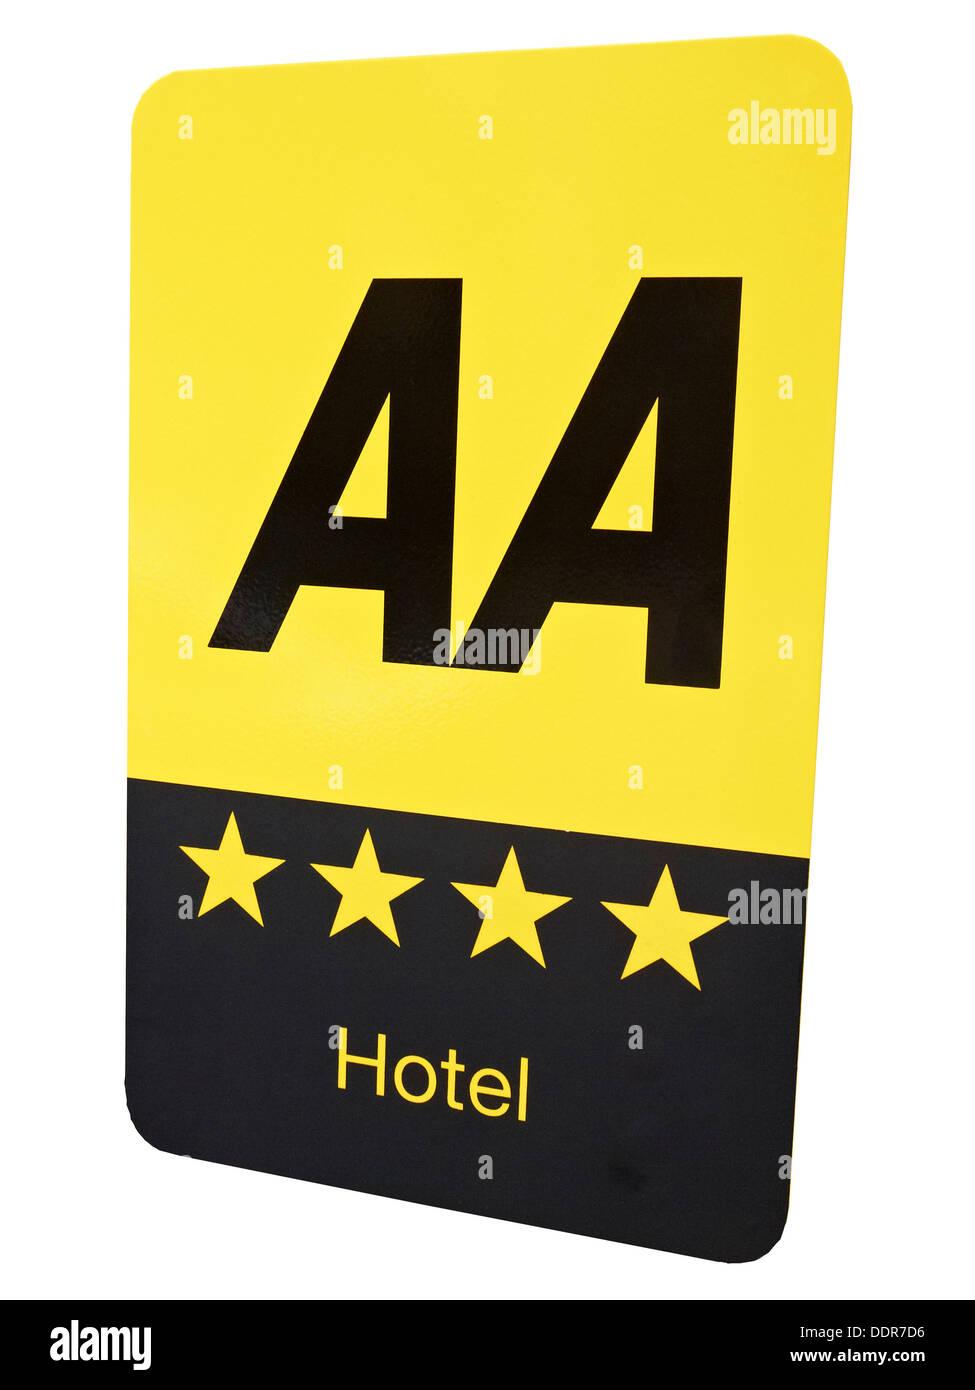 AA 4star hotel sign UK - Stock Image